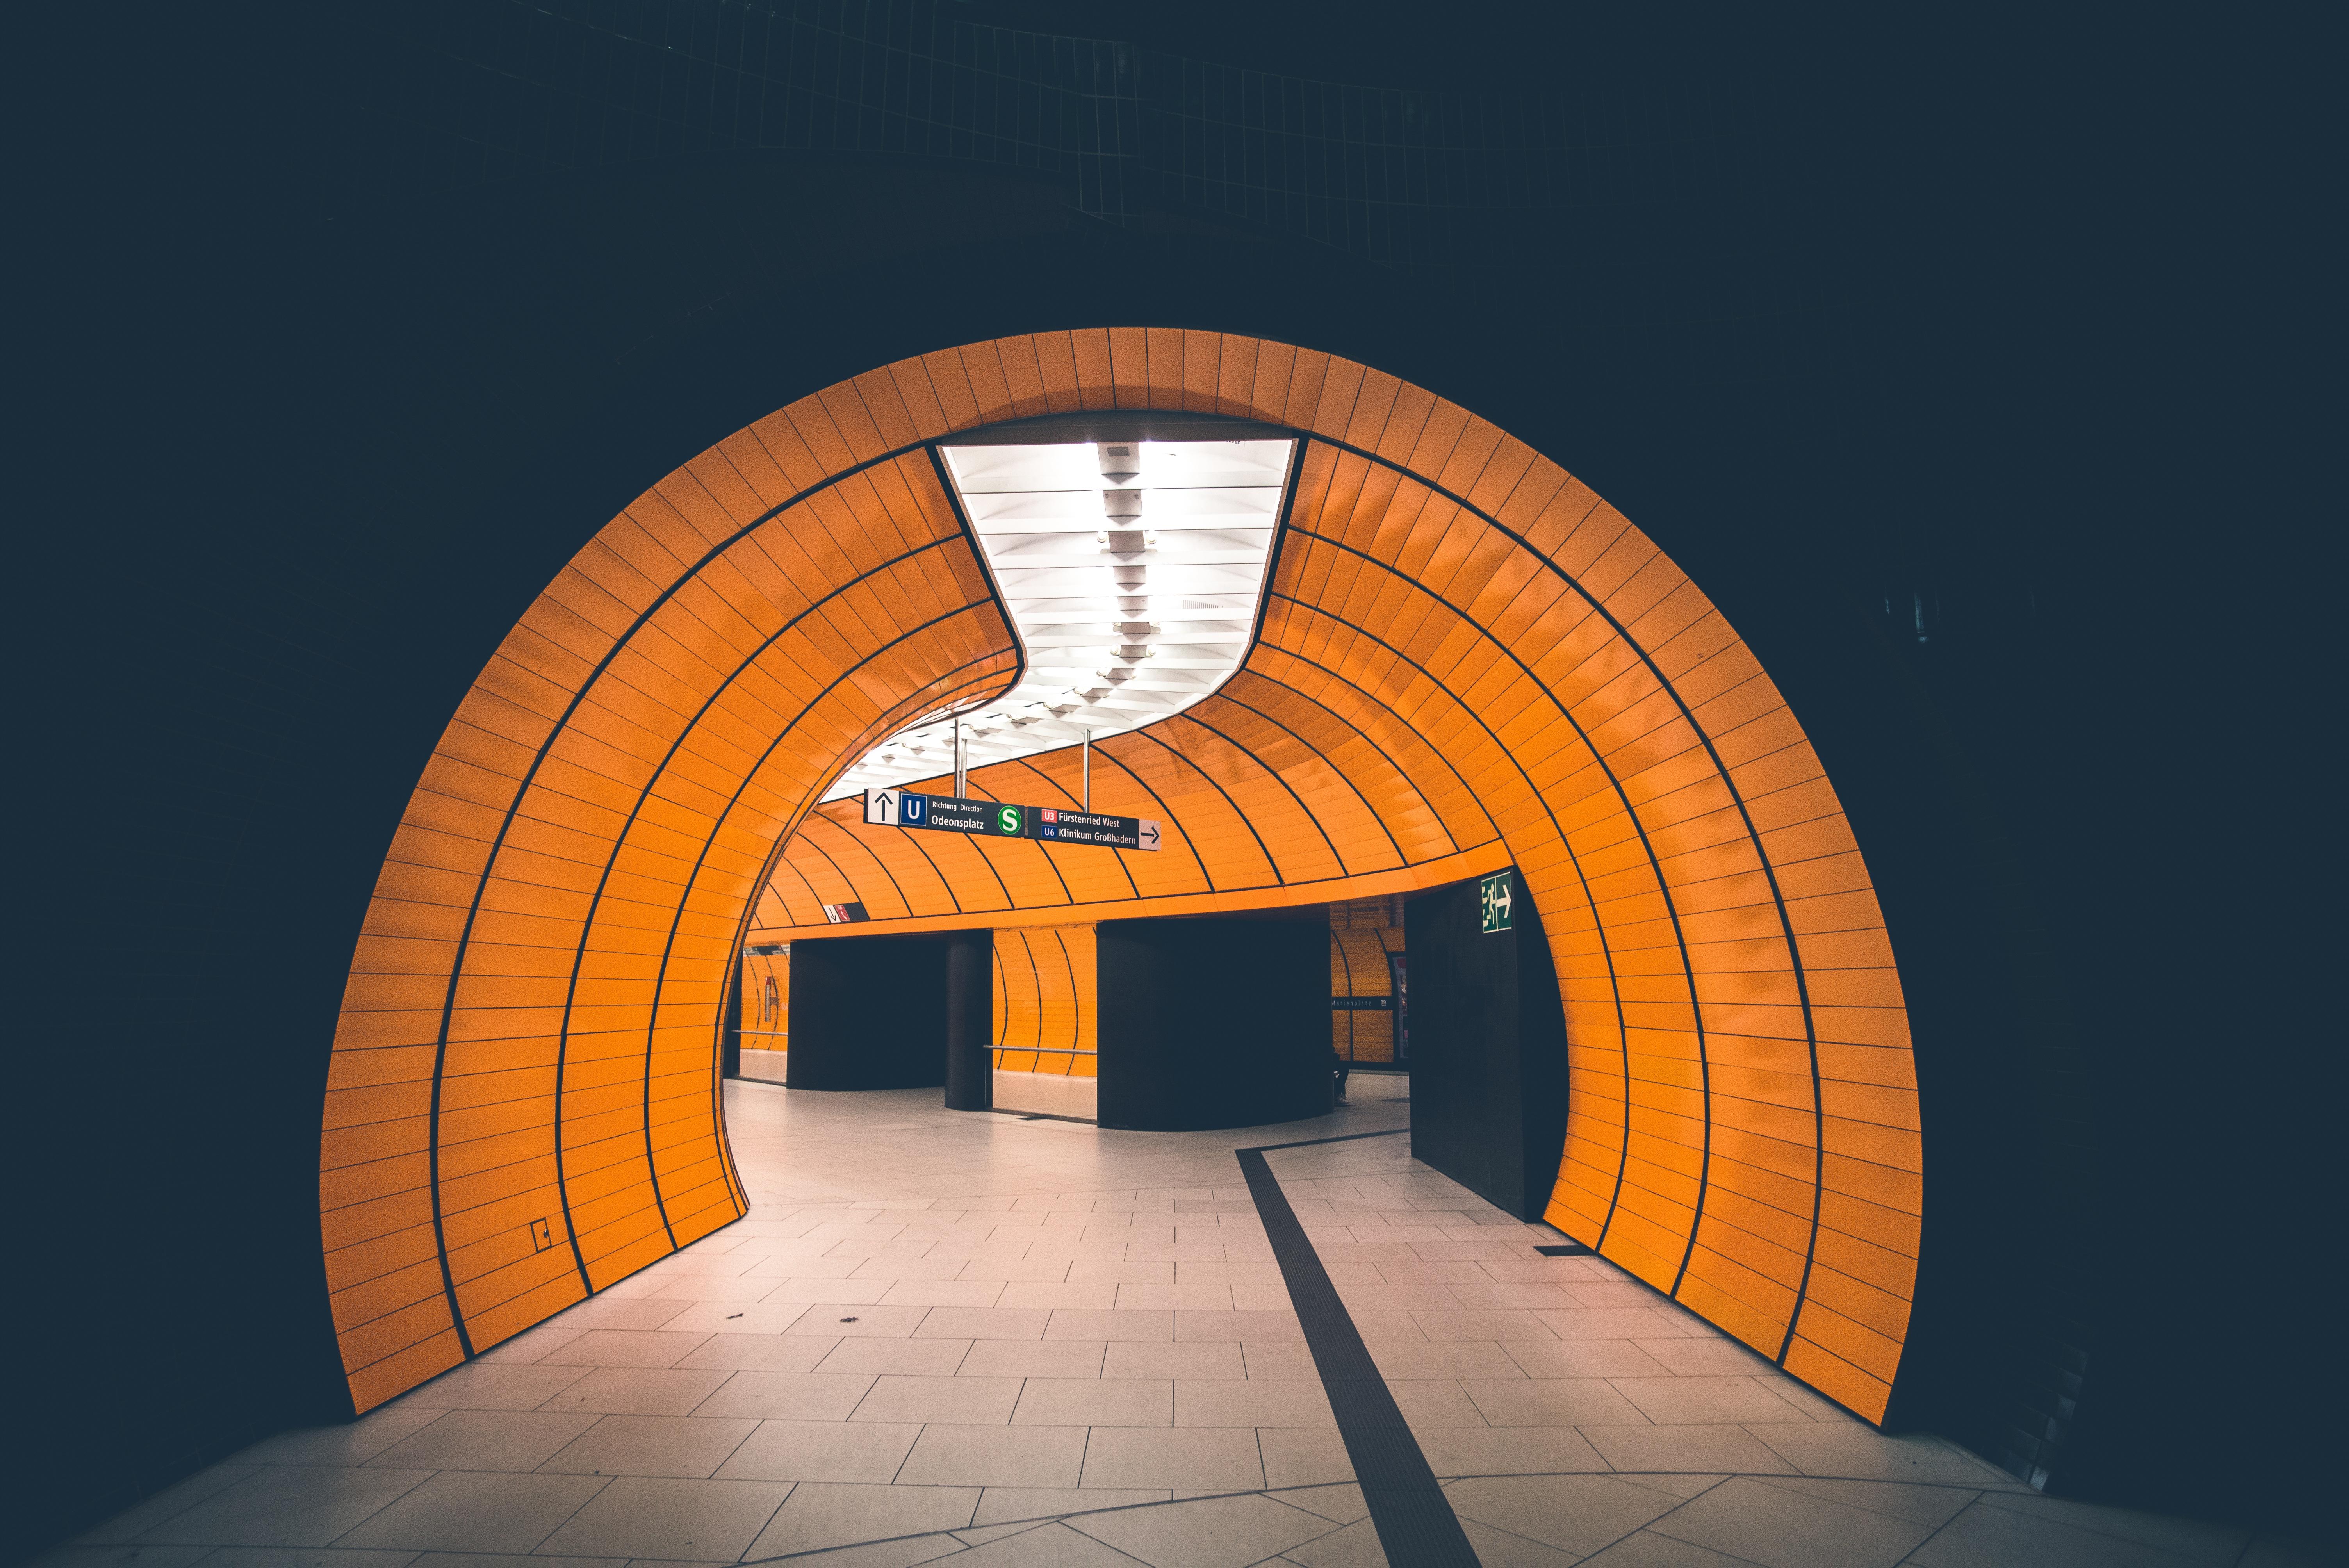 Fotos gratis ligero arquitectura espiral ciudad for Arquitectura en linea gratis